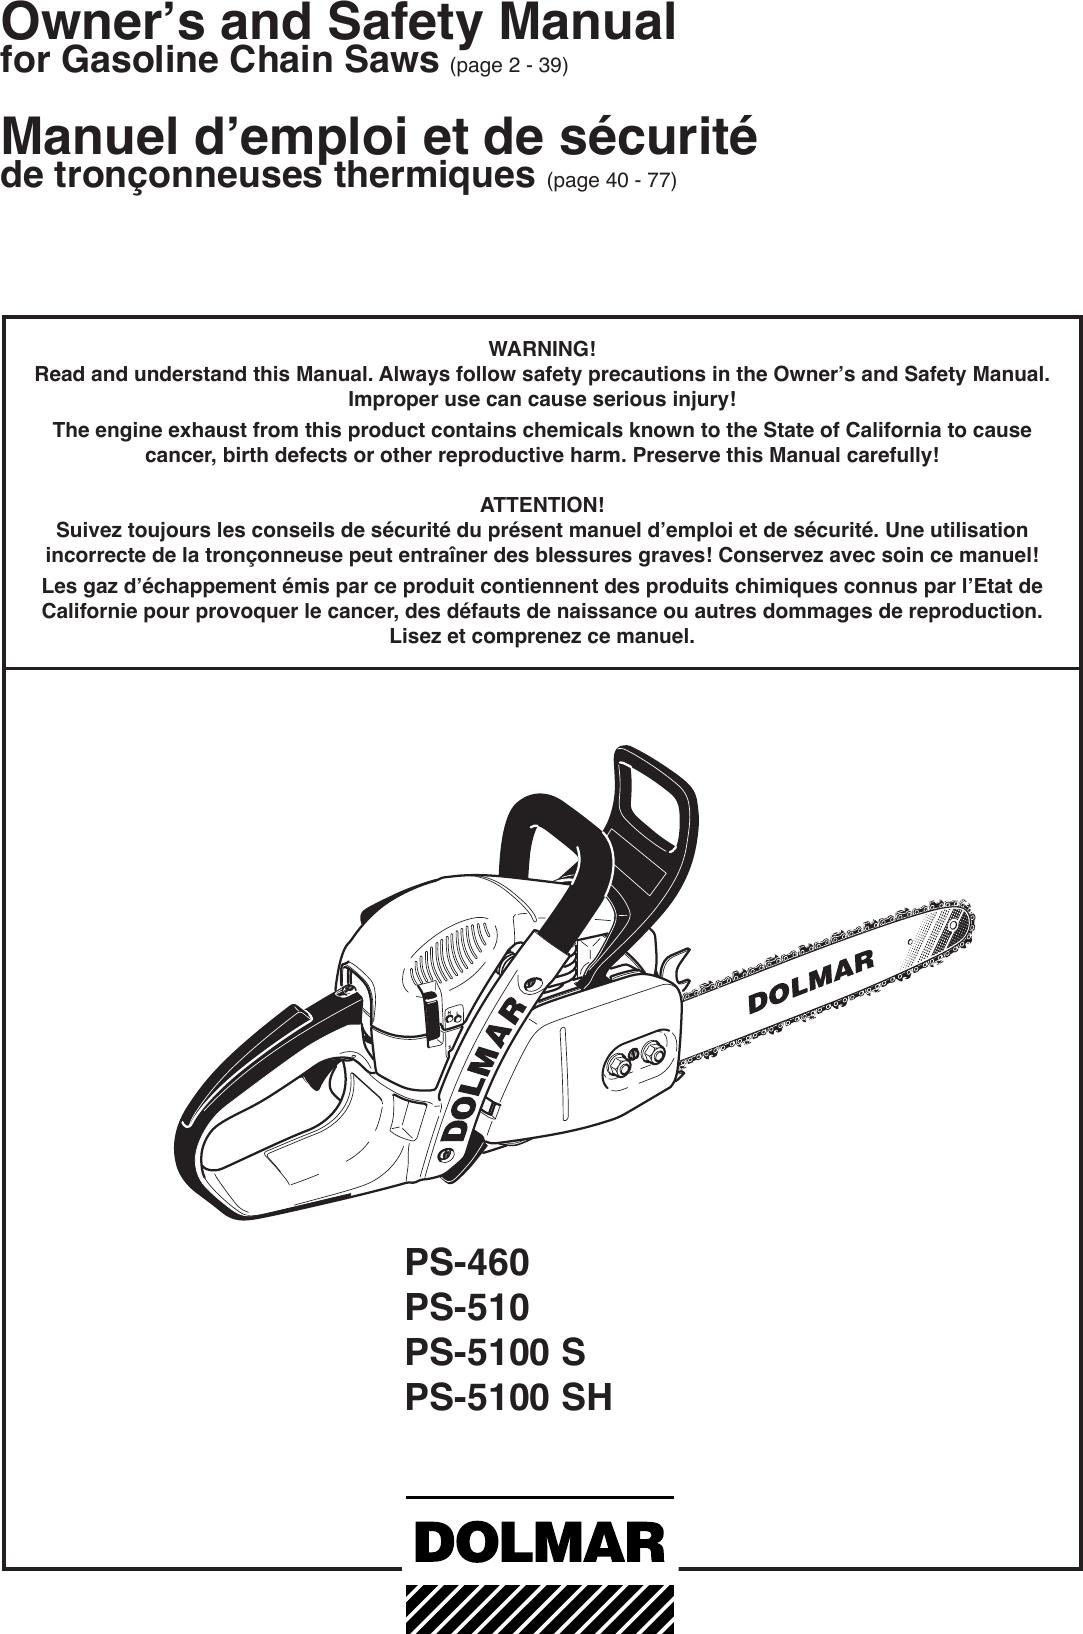 Dolmar Ps 460 Users Manual